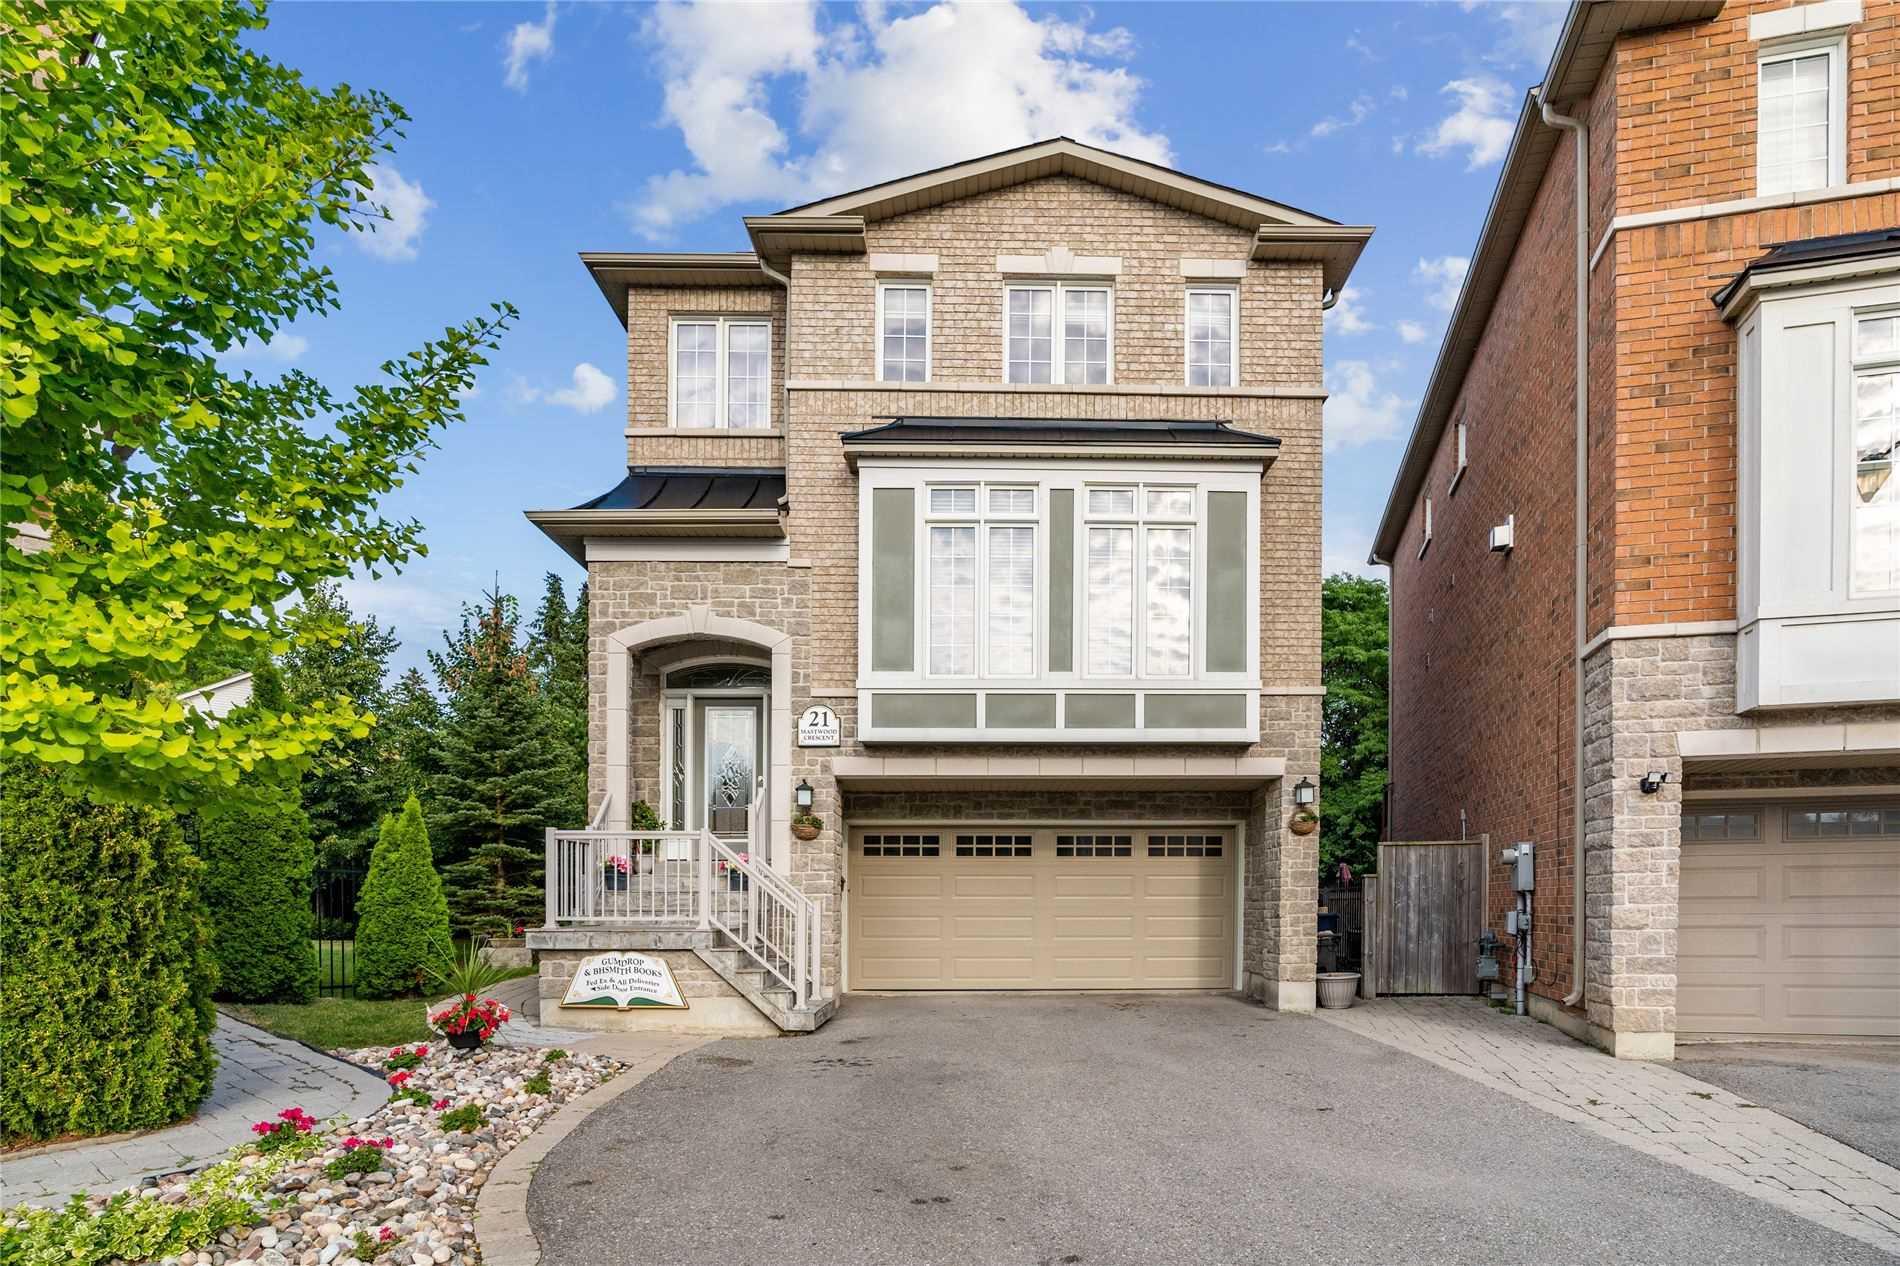 21 Mastwood Cres, Toronto, Ontario M1C0B3, 4 Bedrooms Bedrooms, 10 Rooms Rooms,4 BathroomsBathrooms,Detached,For Sale,Mastwood,E5362701